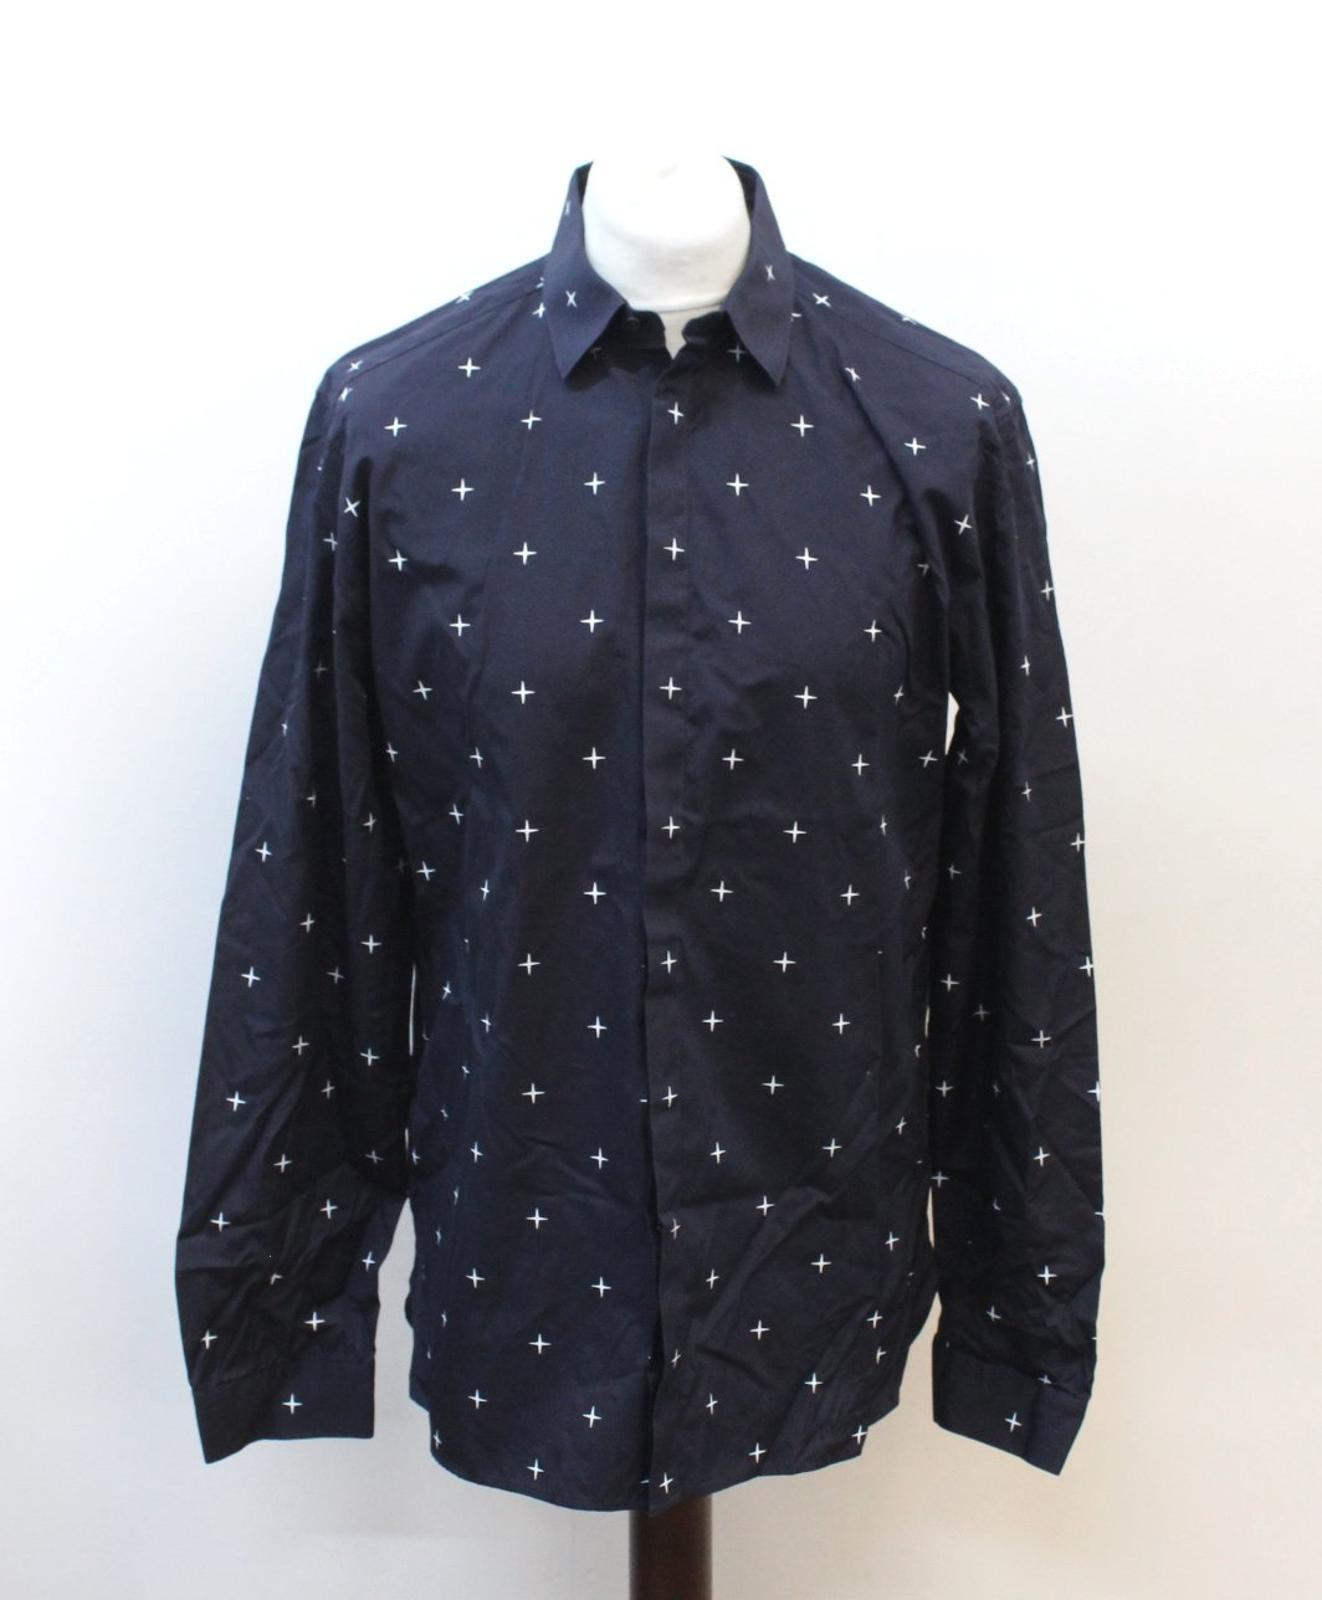 Neil-Barrett-Hombre-Azul-Marino-Blanco-Cuello-De-Camisa-formal-calce-Cruz-16-5-034-42cm miniatura 11